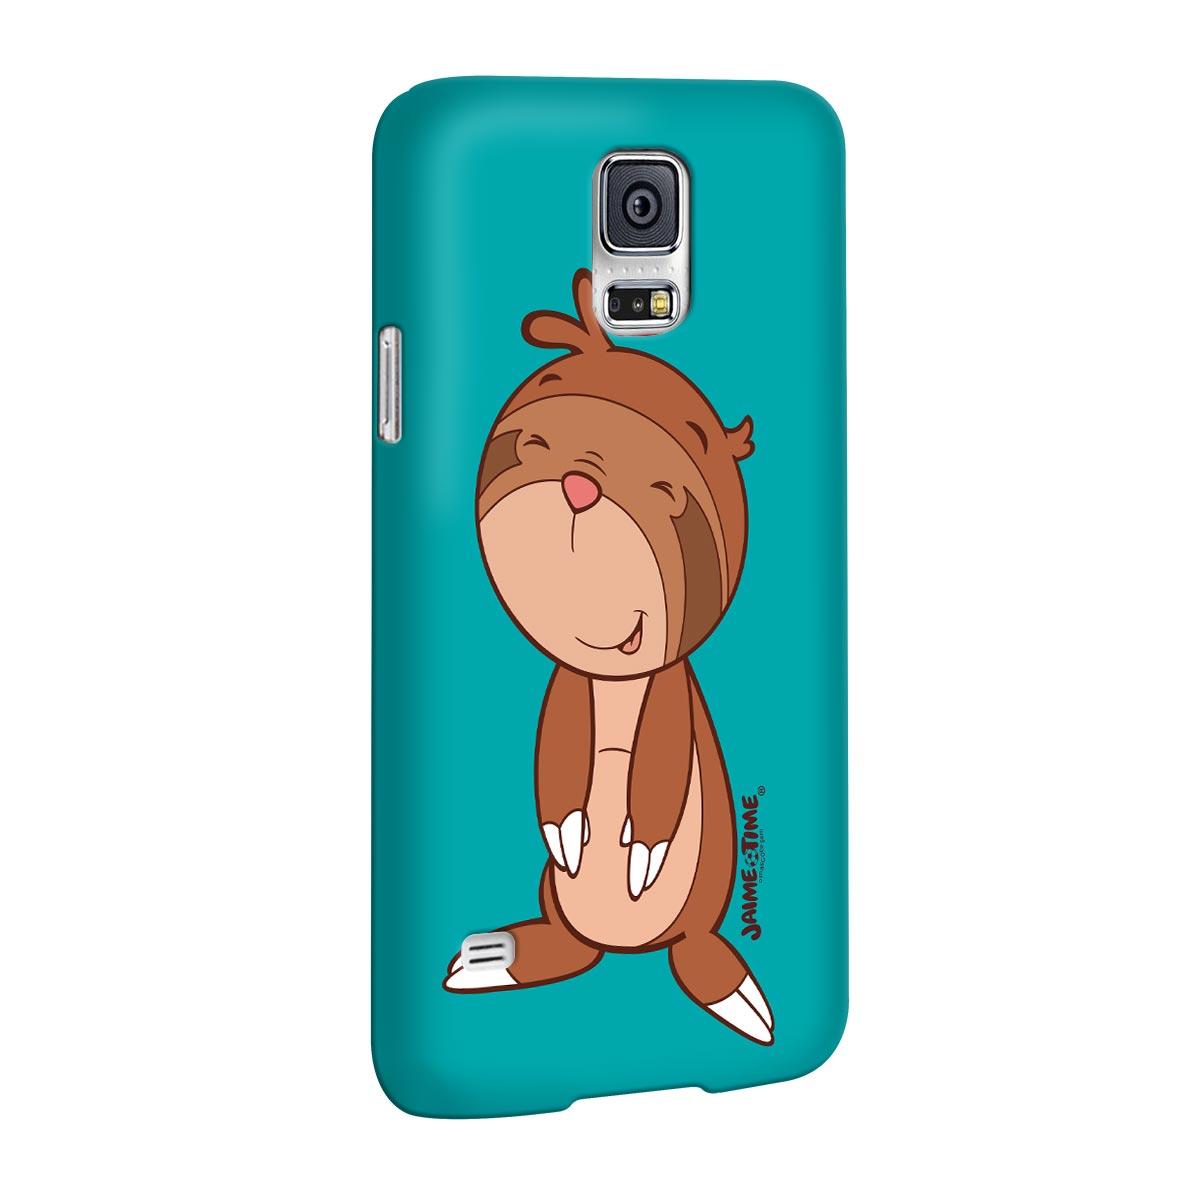 Capa para Samsung Galaxy S5 Jaime Mascote